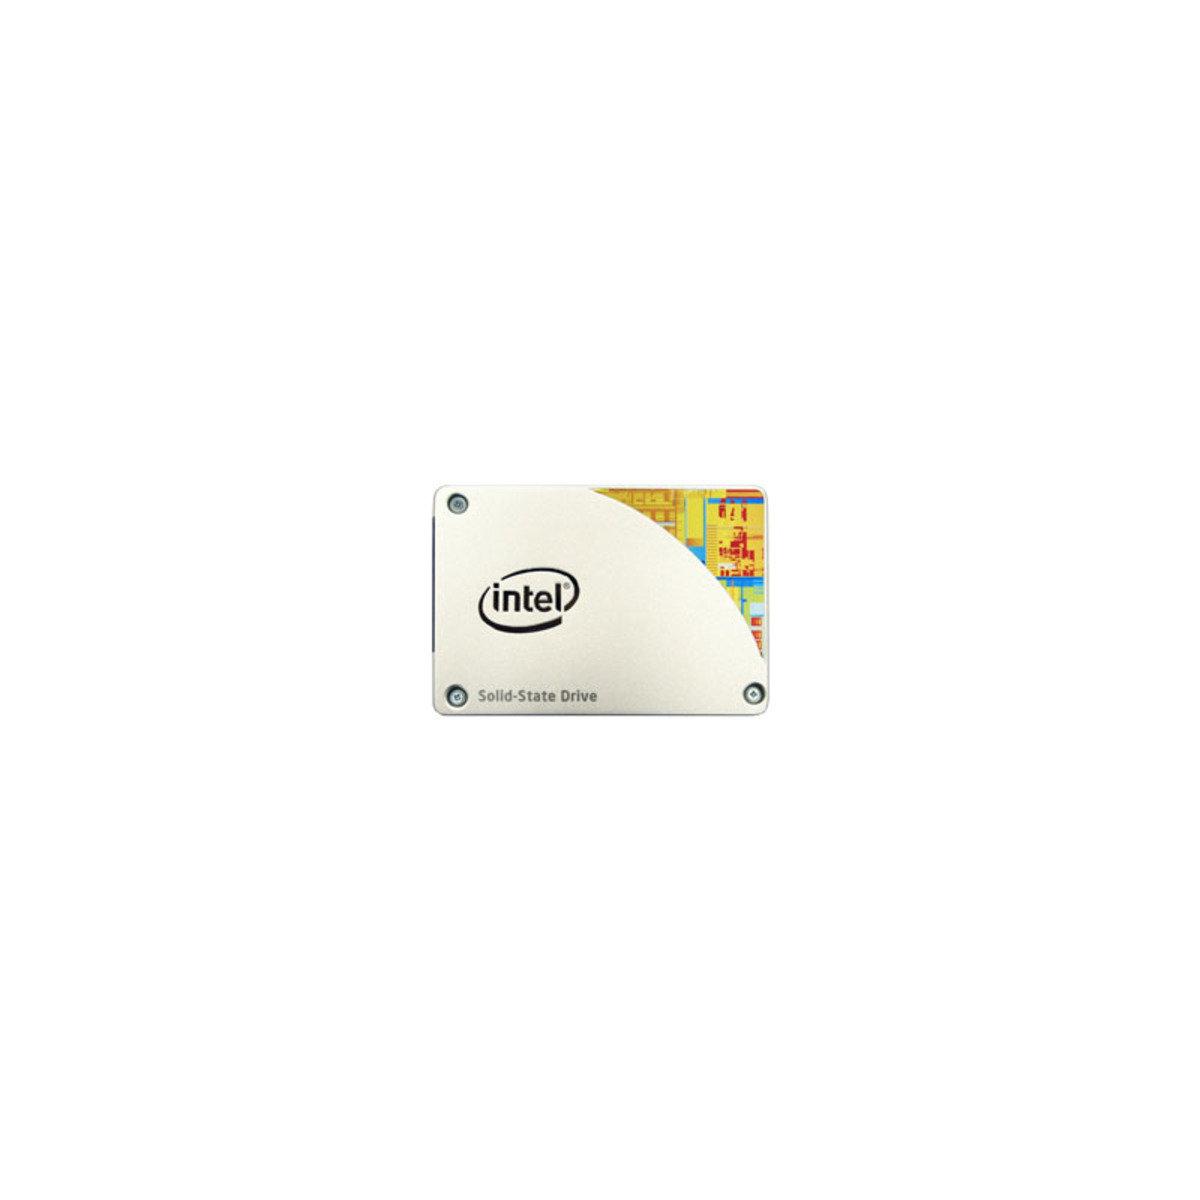 SSD 高速內置固態硬碟 535系列 120GB [OEM包裝]